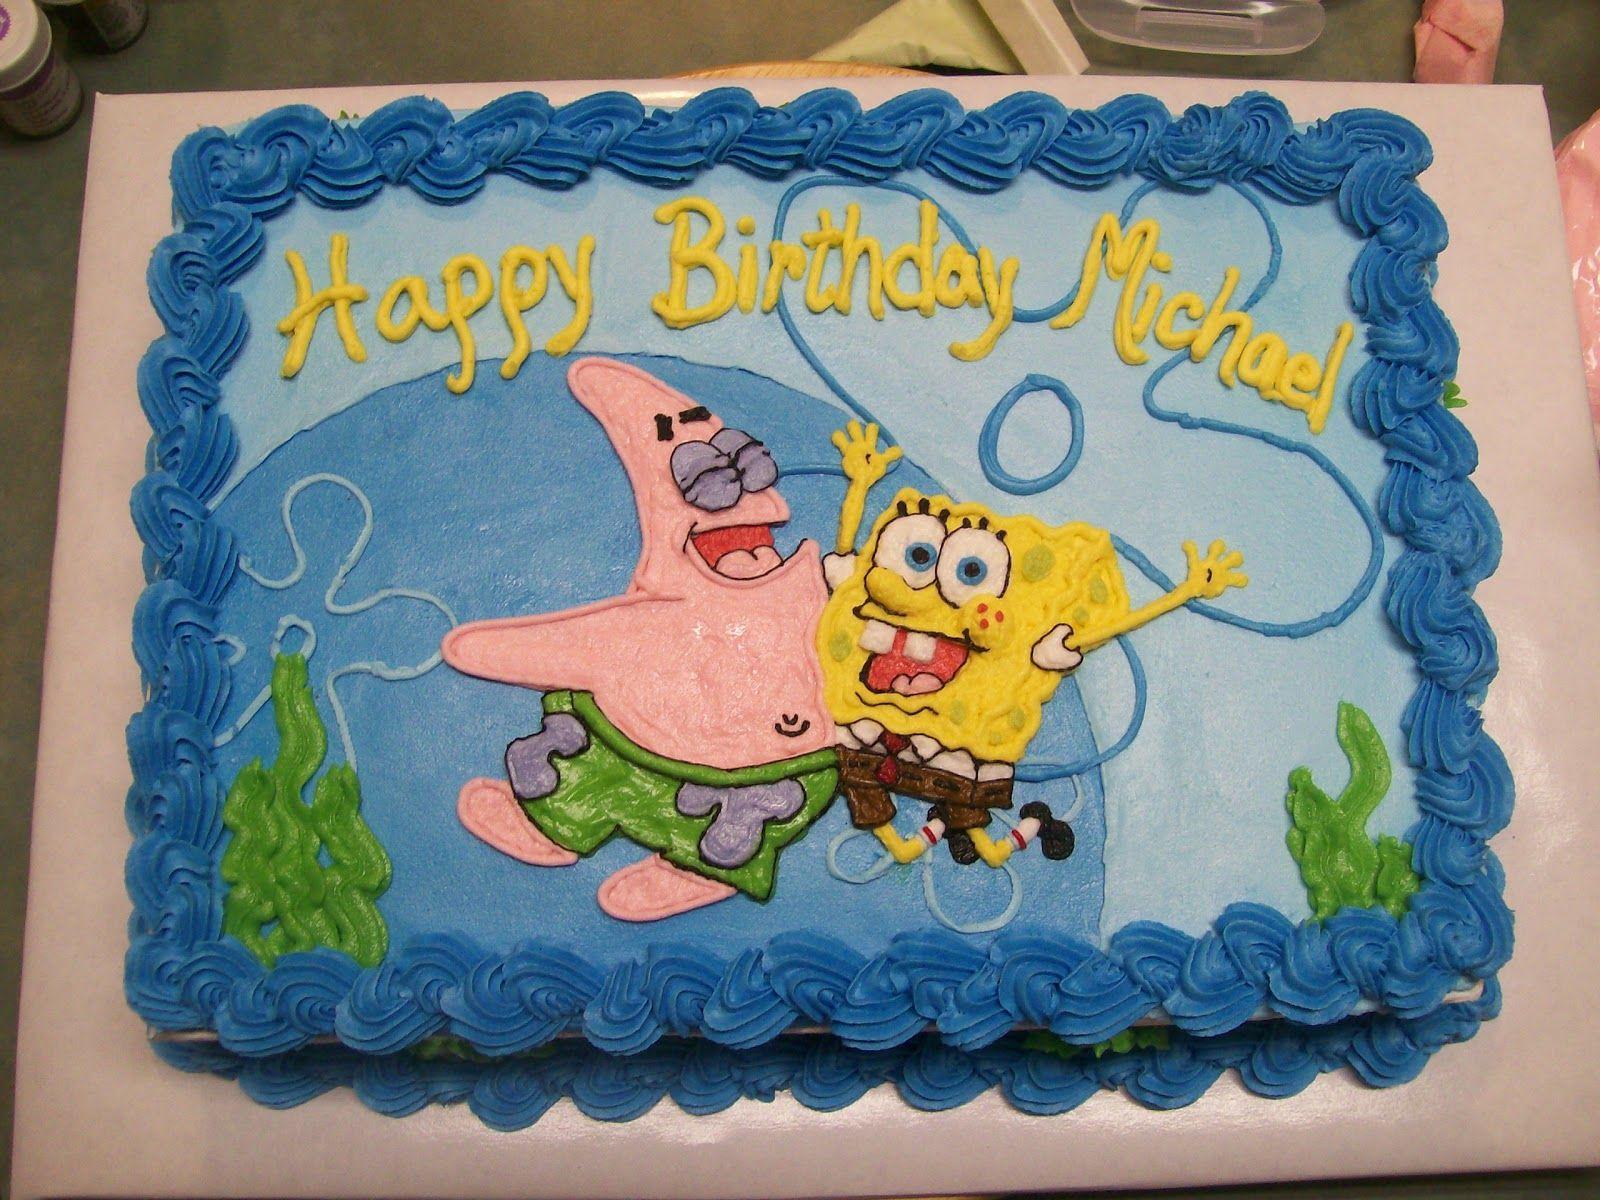 Spongebob Squarepants Buttercream Cake Spongebob And Patrick